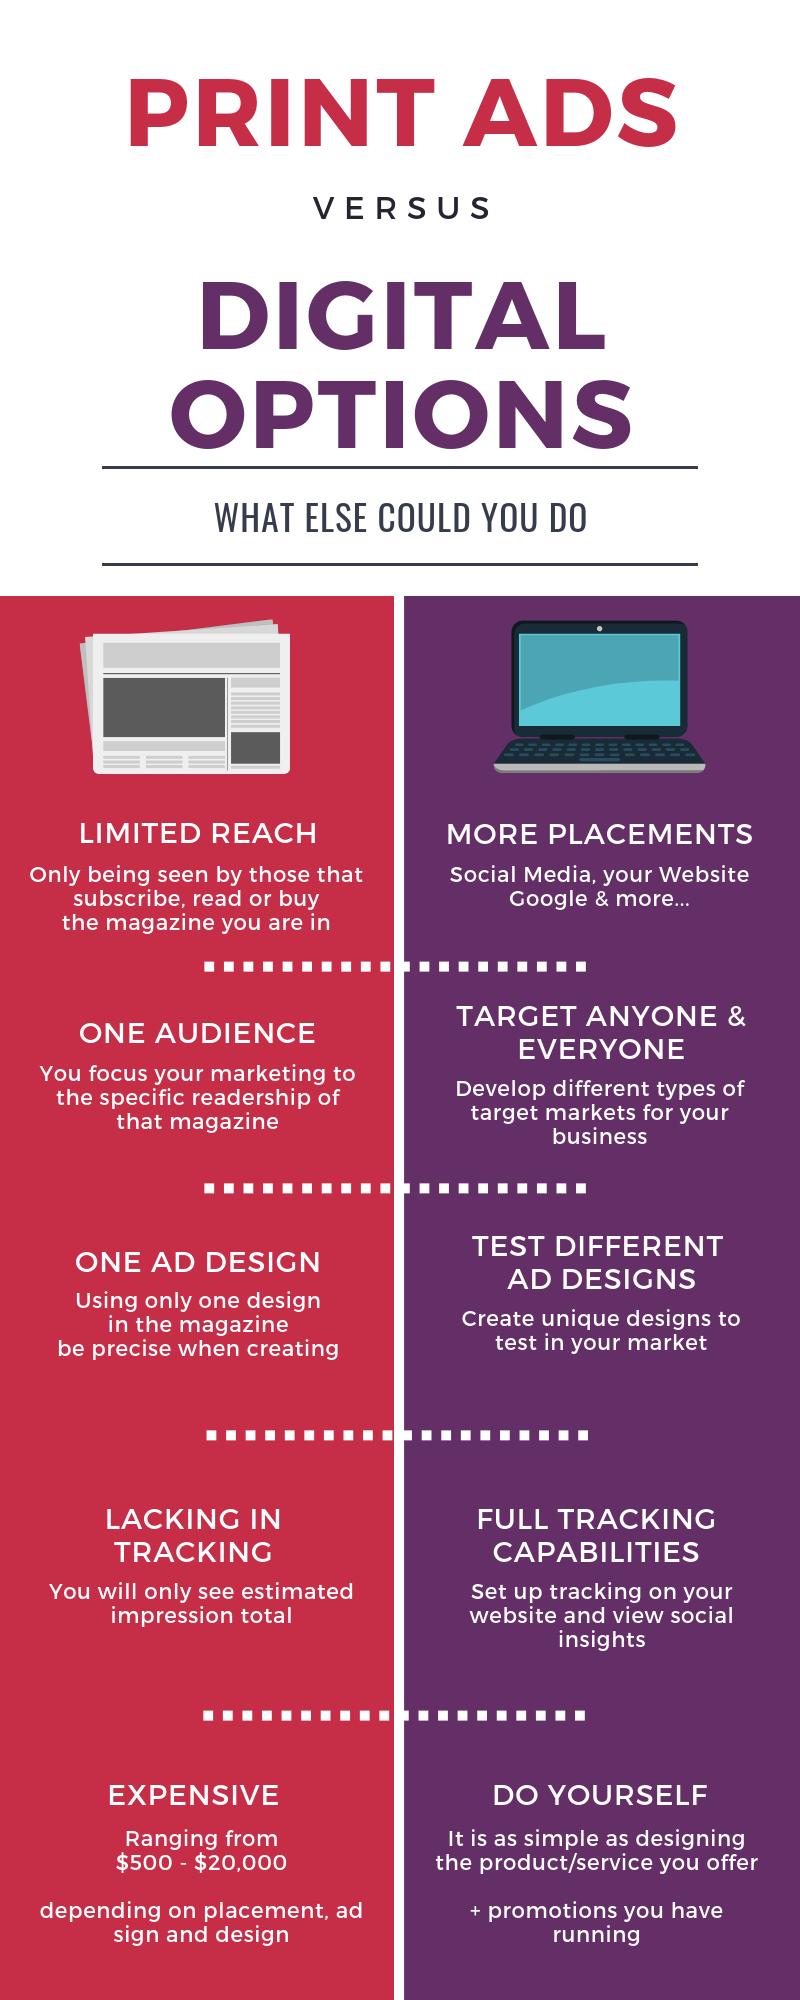 Google Ads Expert - Google Ads Manager